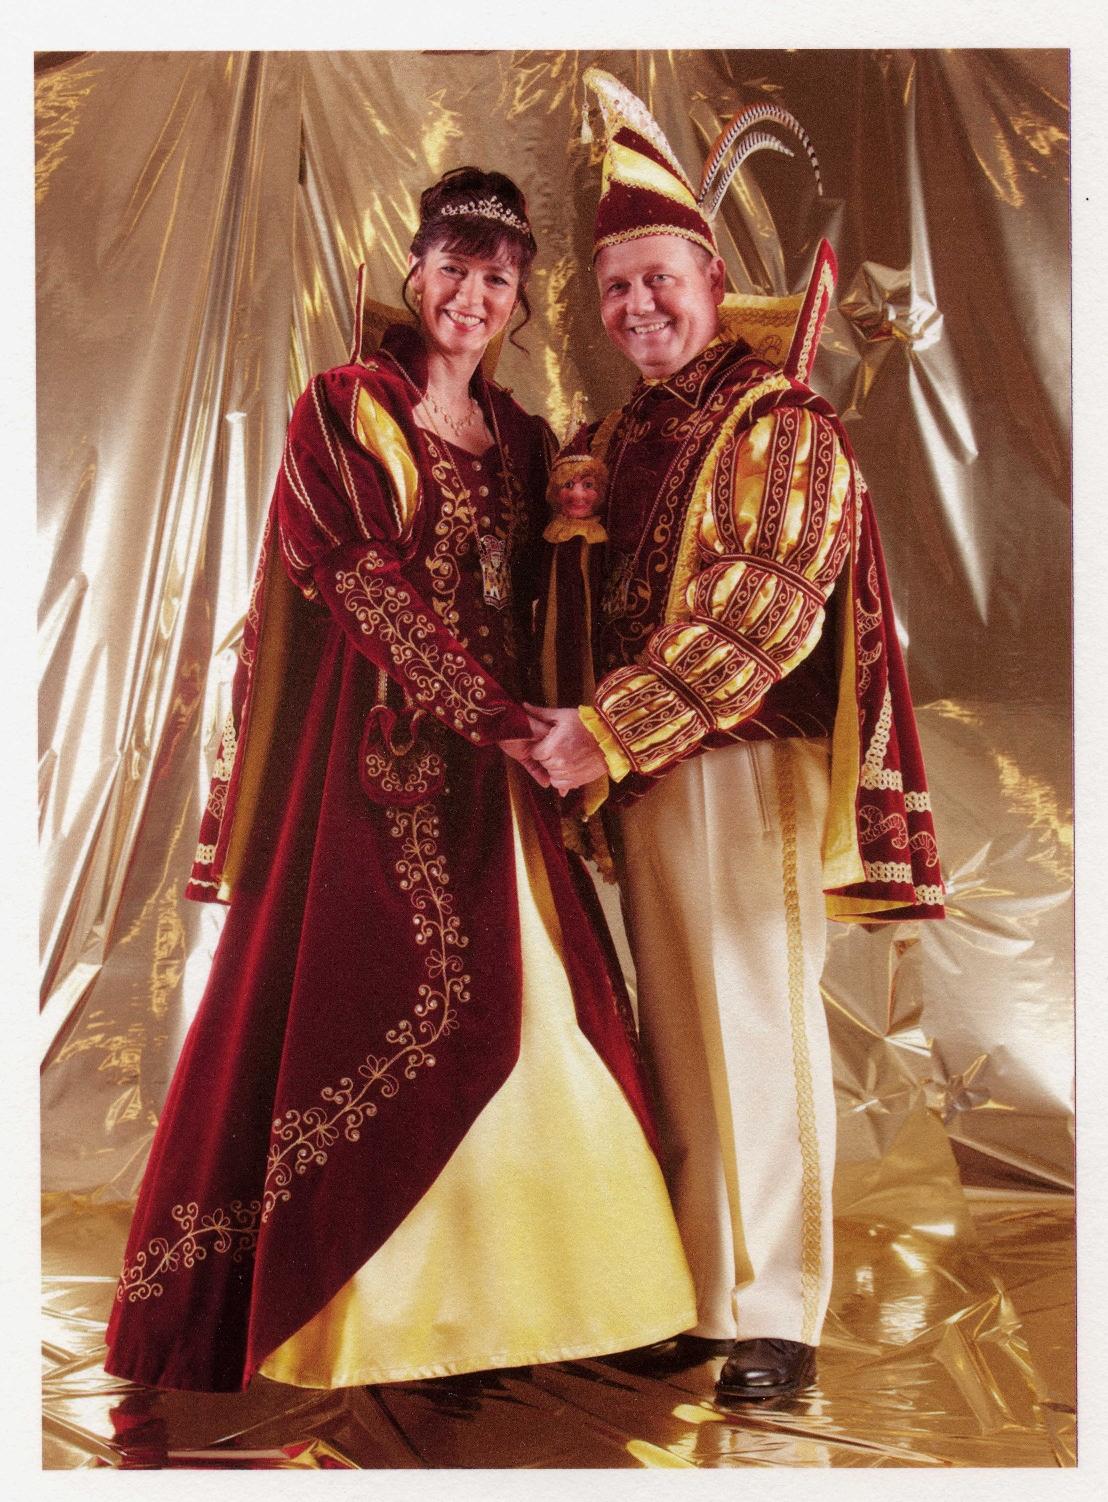 Prinz Dieter I & Prinzessin Ursel I